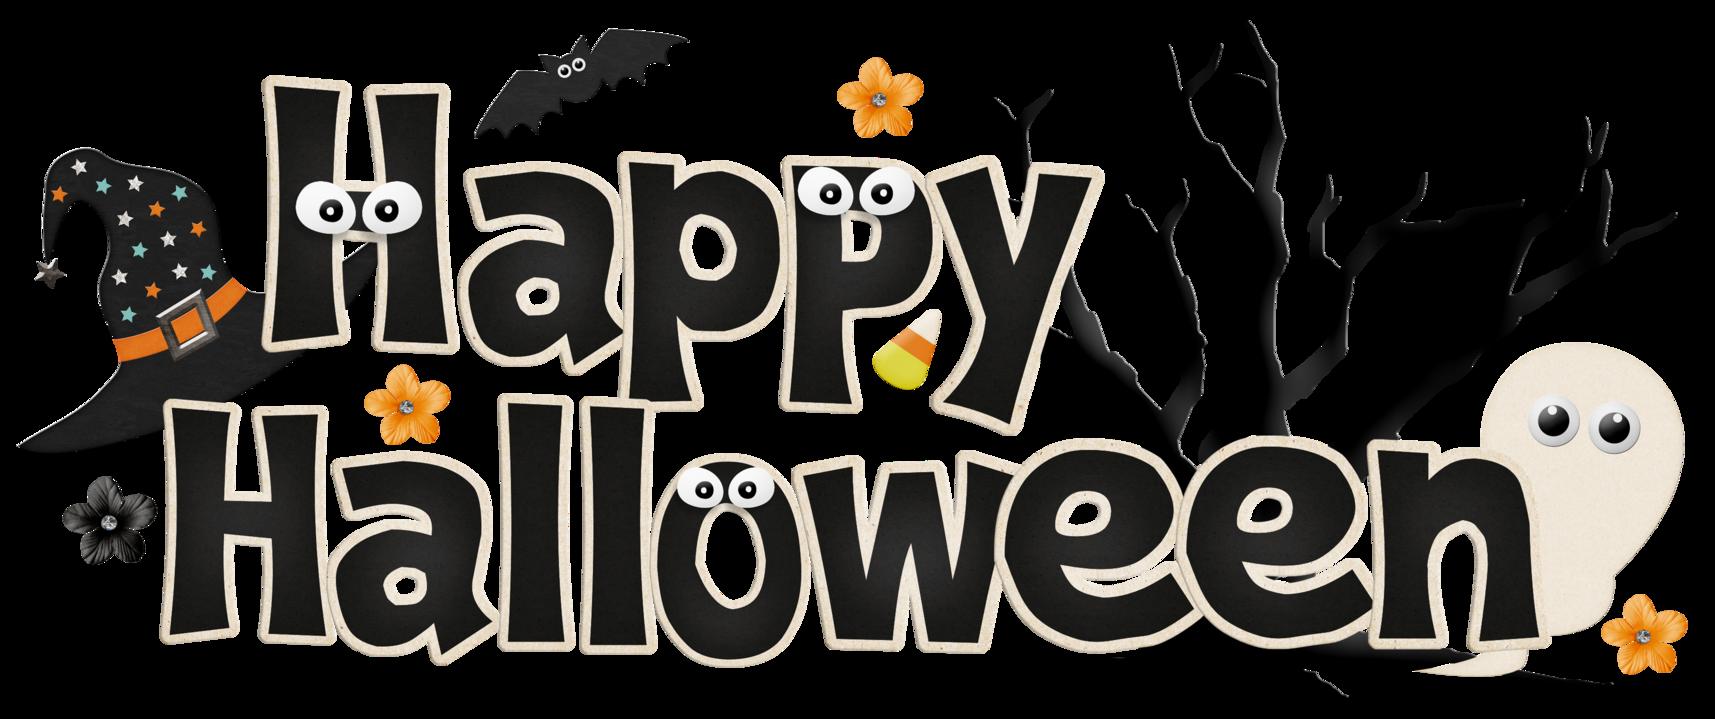 Happy halloween png clipart-Happy halloween png clipart-17